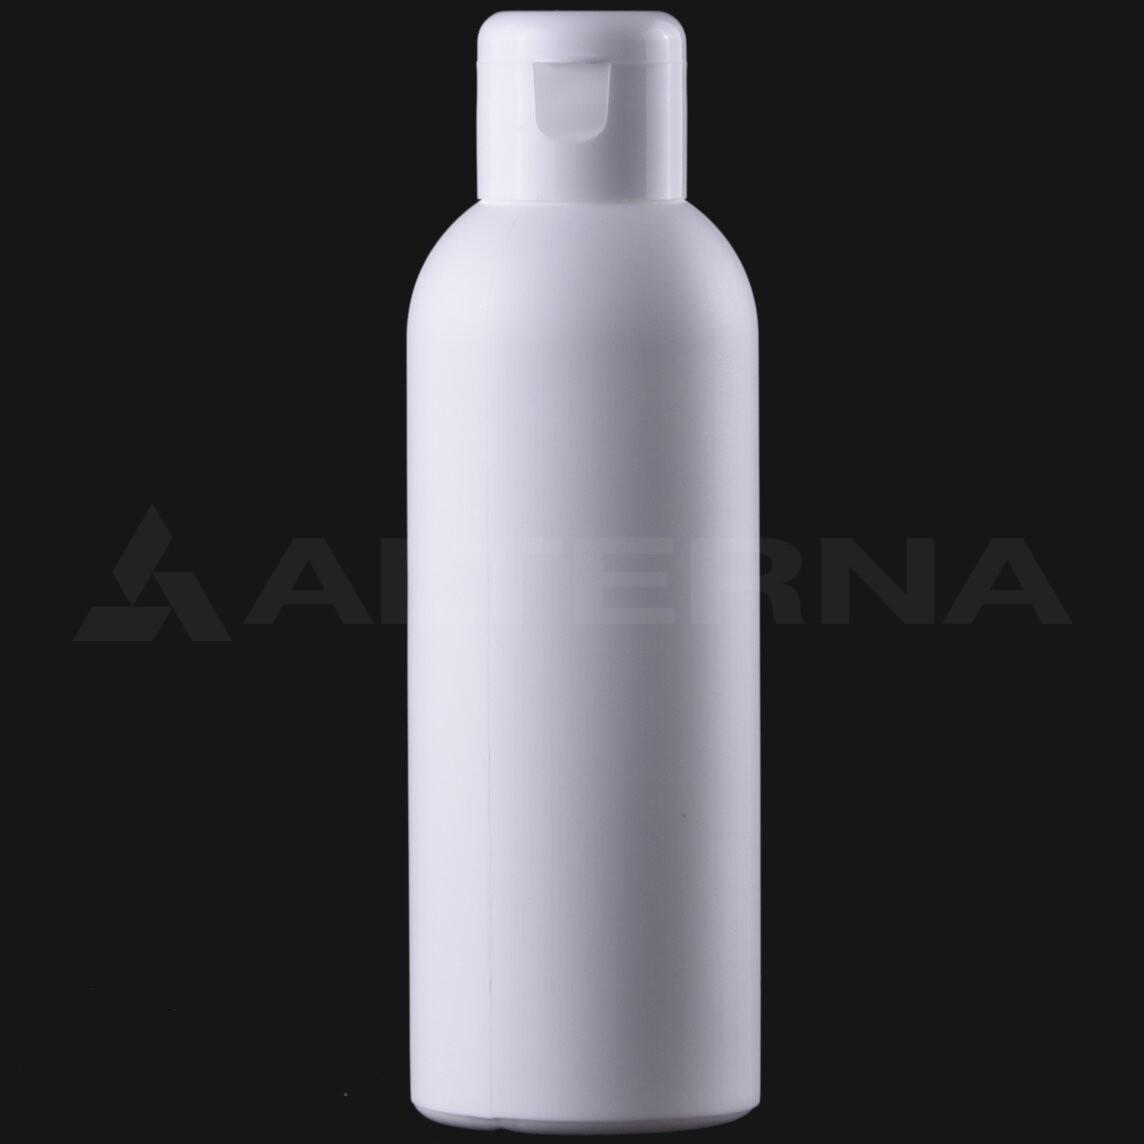 150 ml HDPE Bottle with 24 mm Flip Top Cap